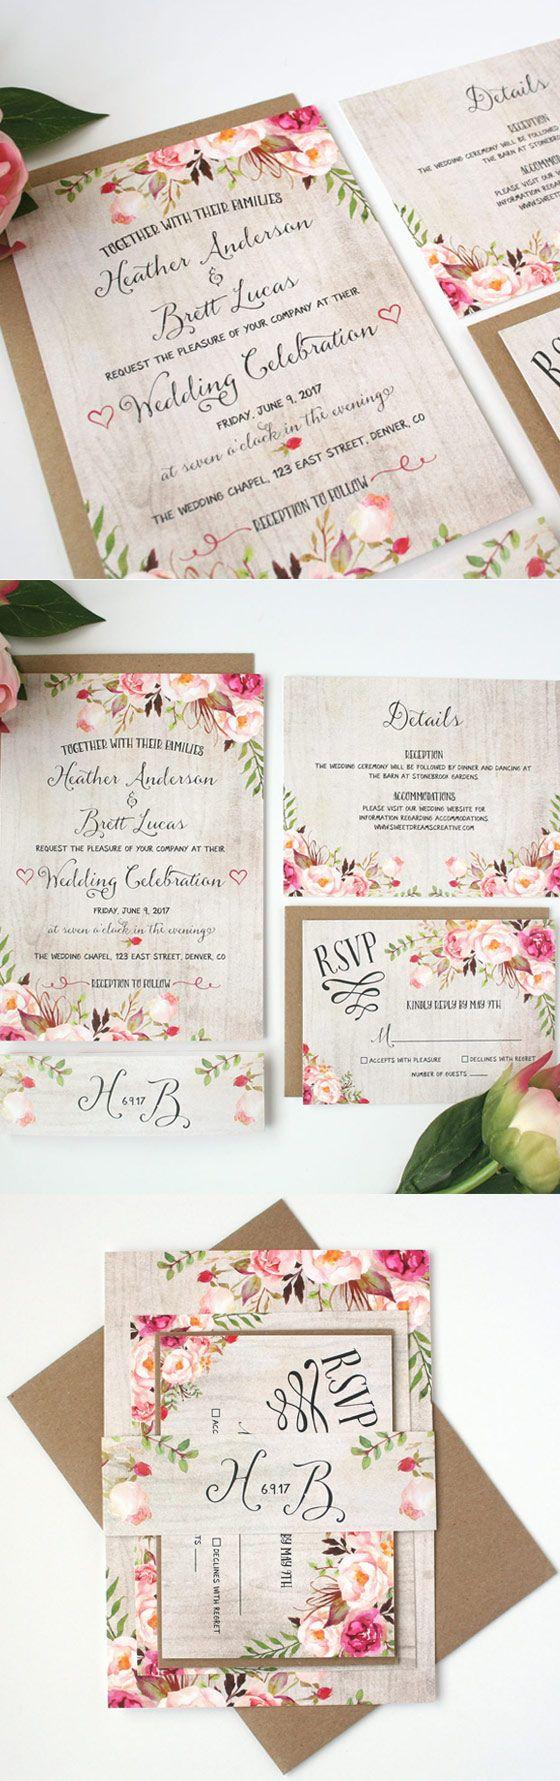 The prettiest rustic wedding invitations!